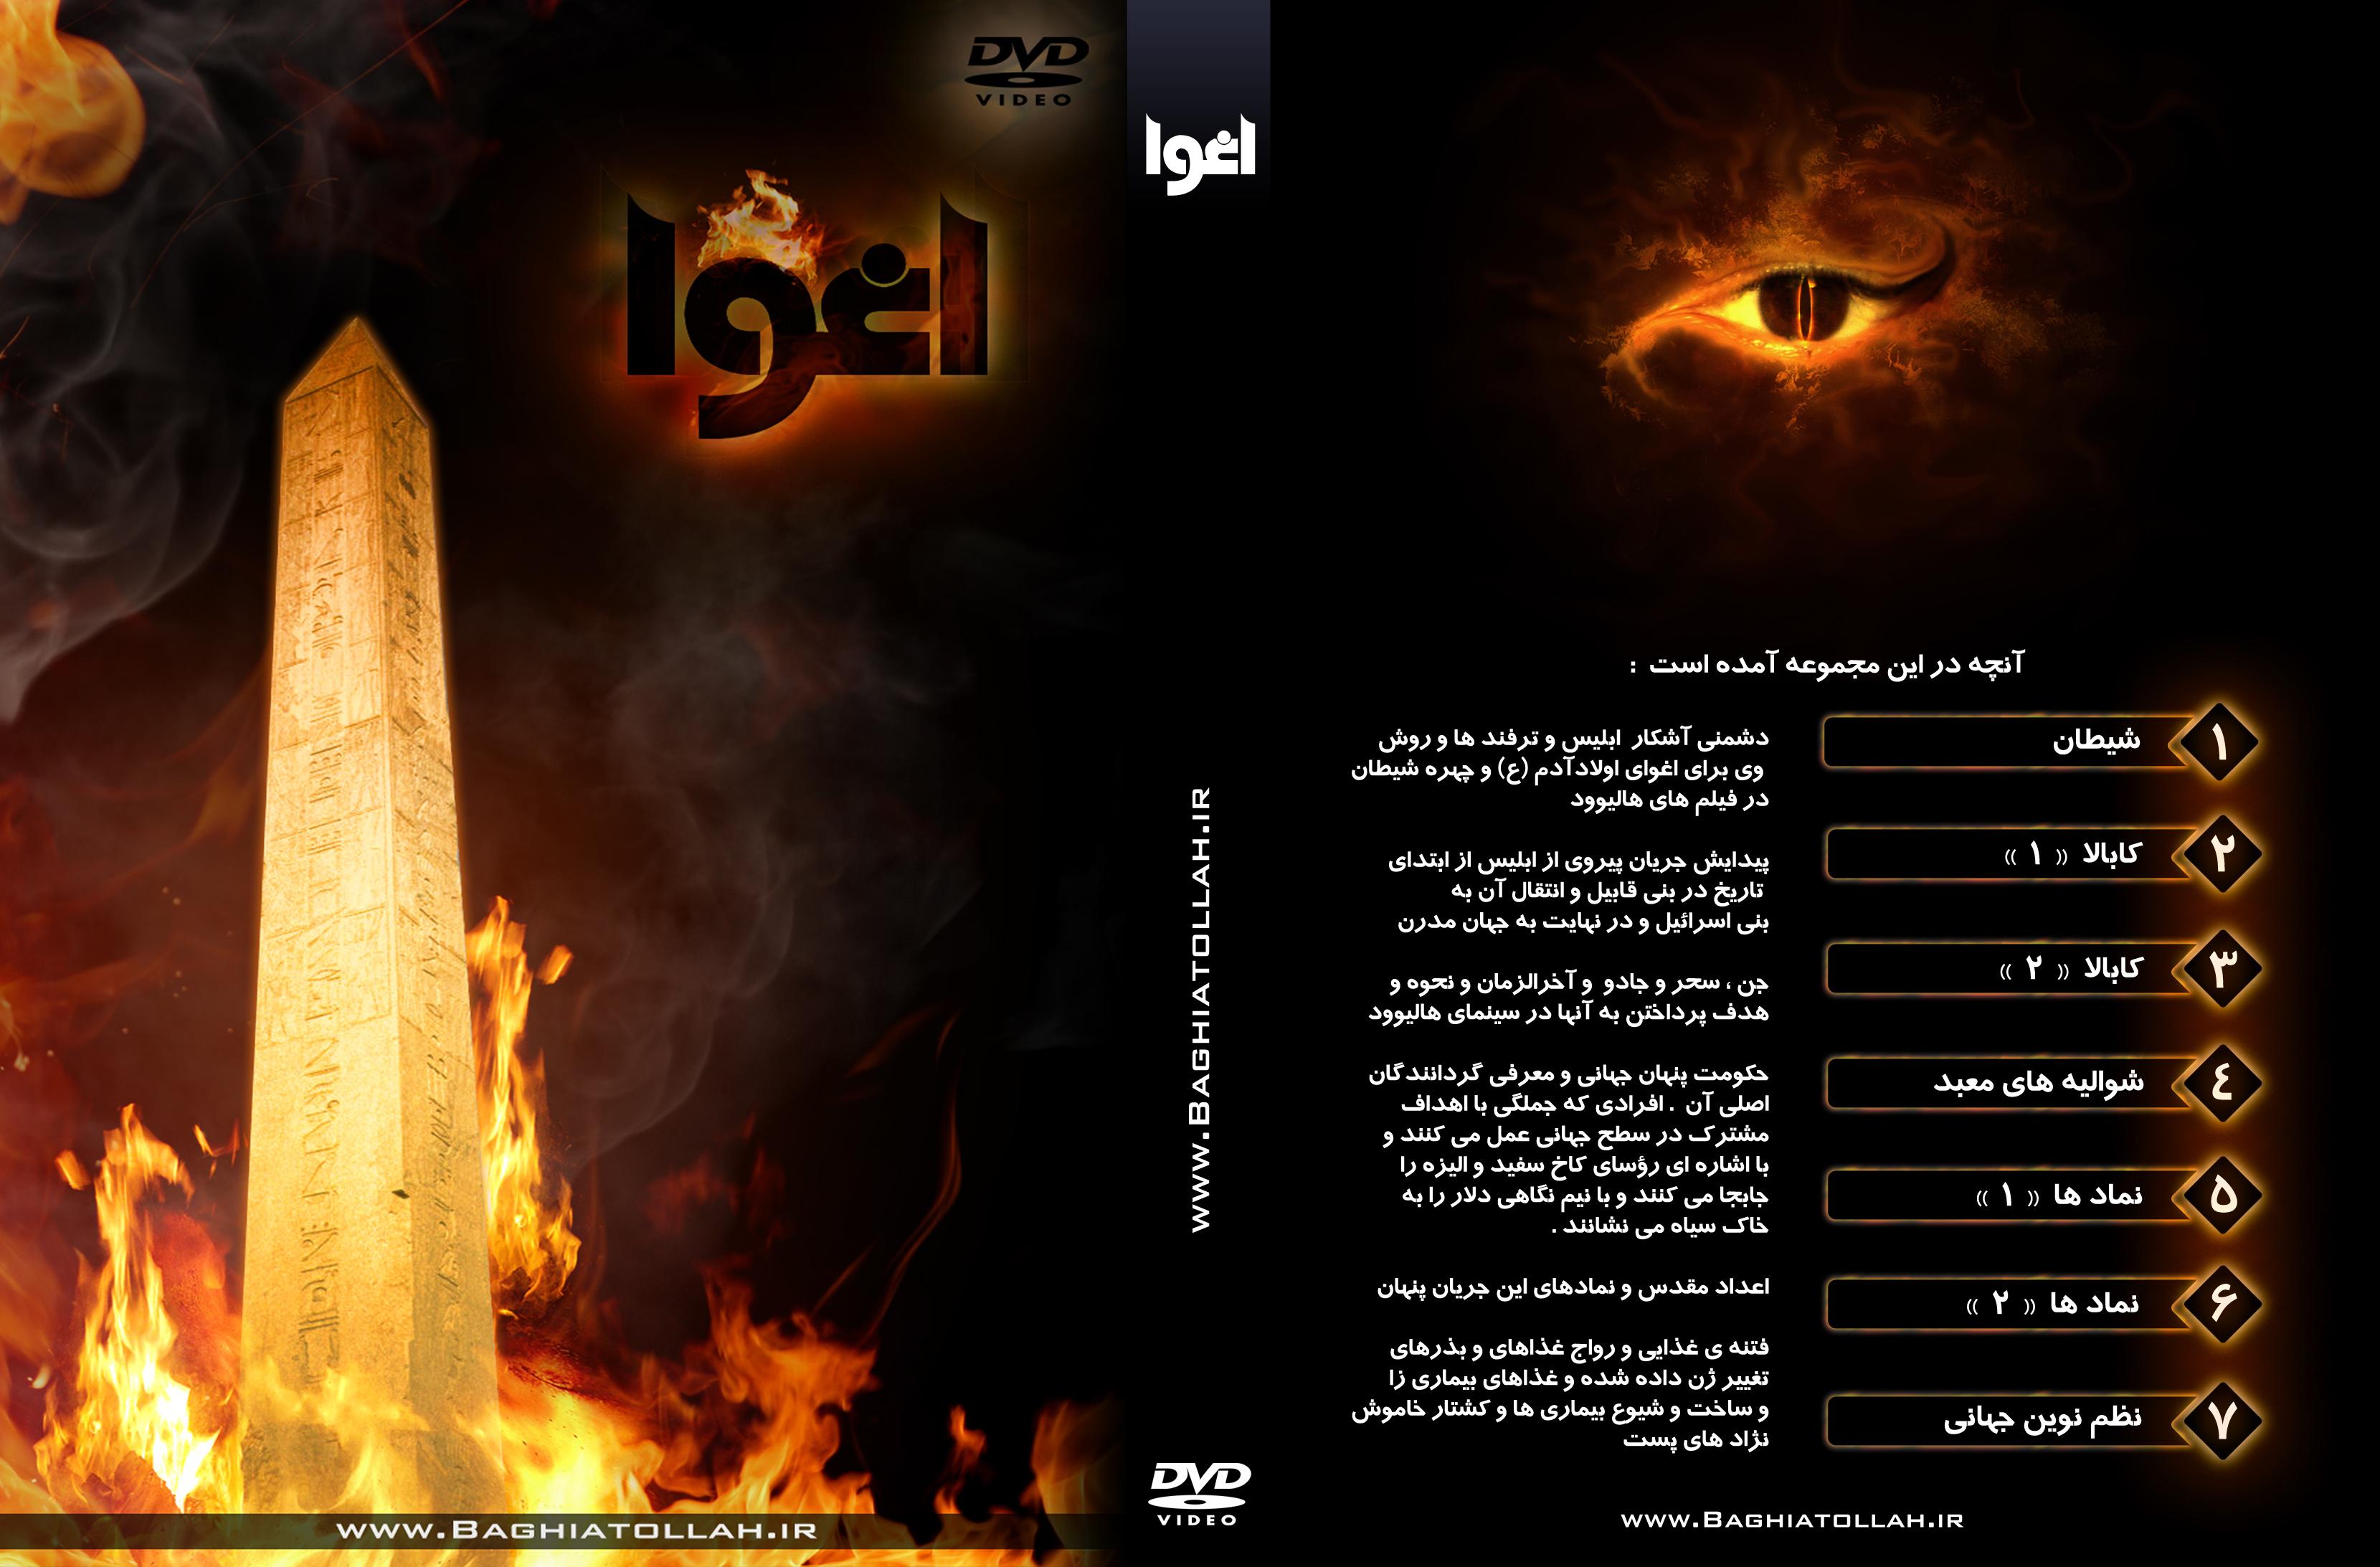 http://baghiatollah.persiangig.com/image/Eghva/Poster/P7.jpg